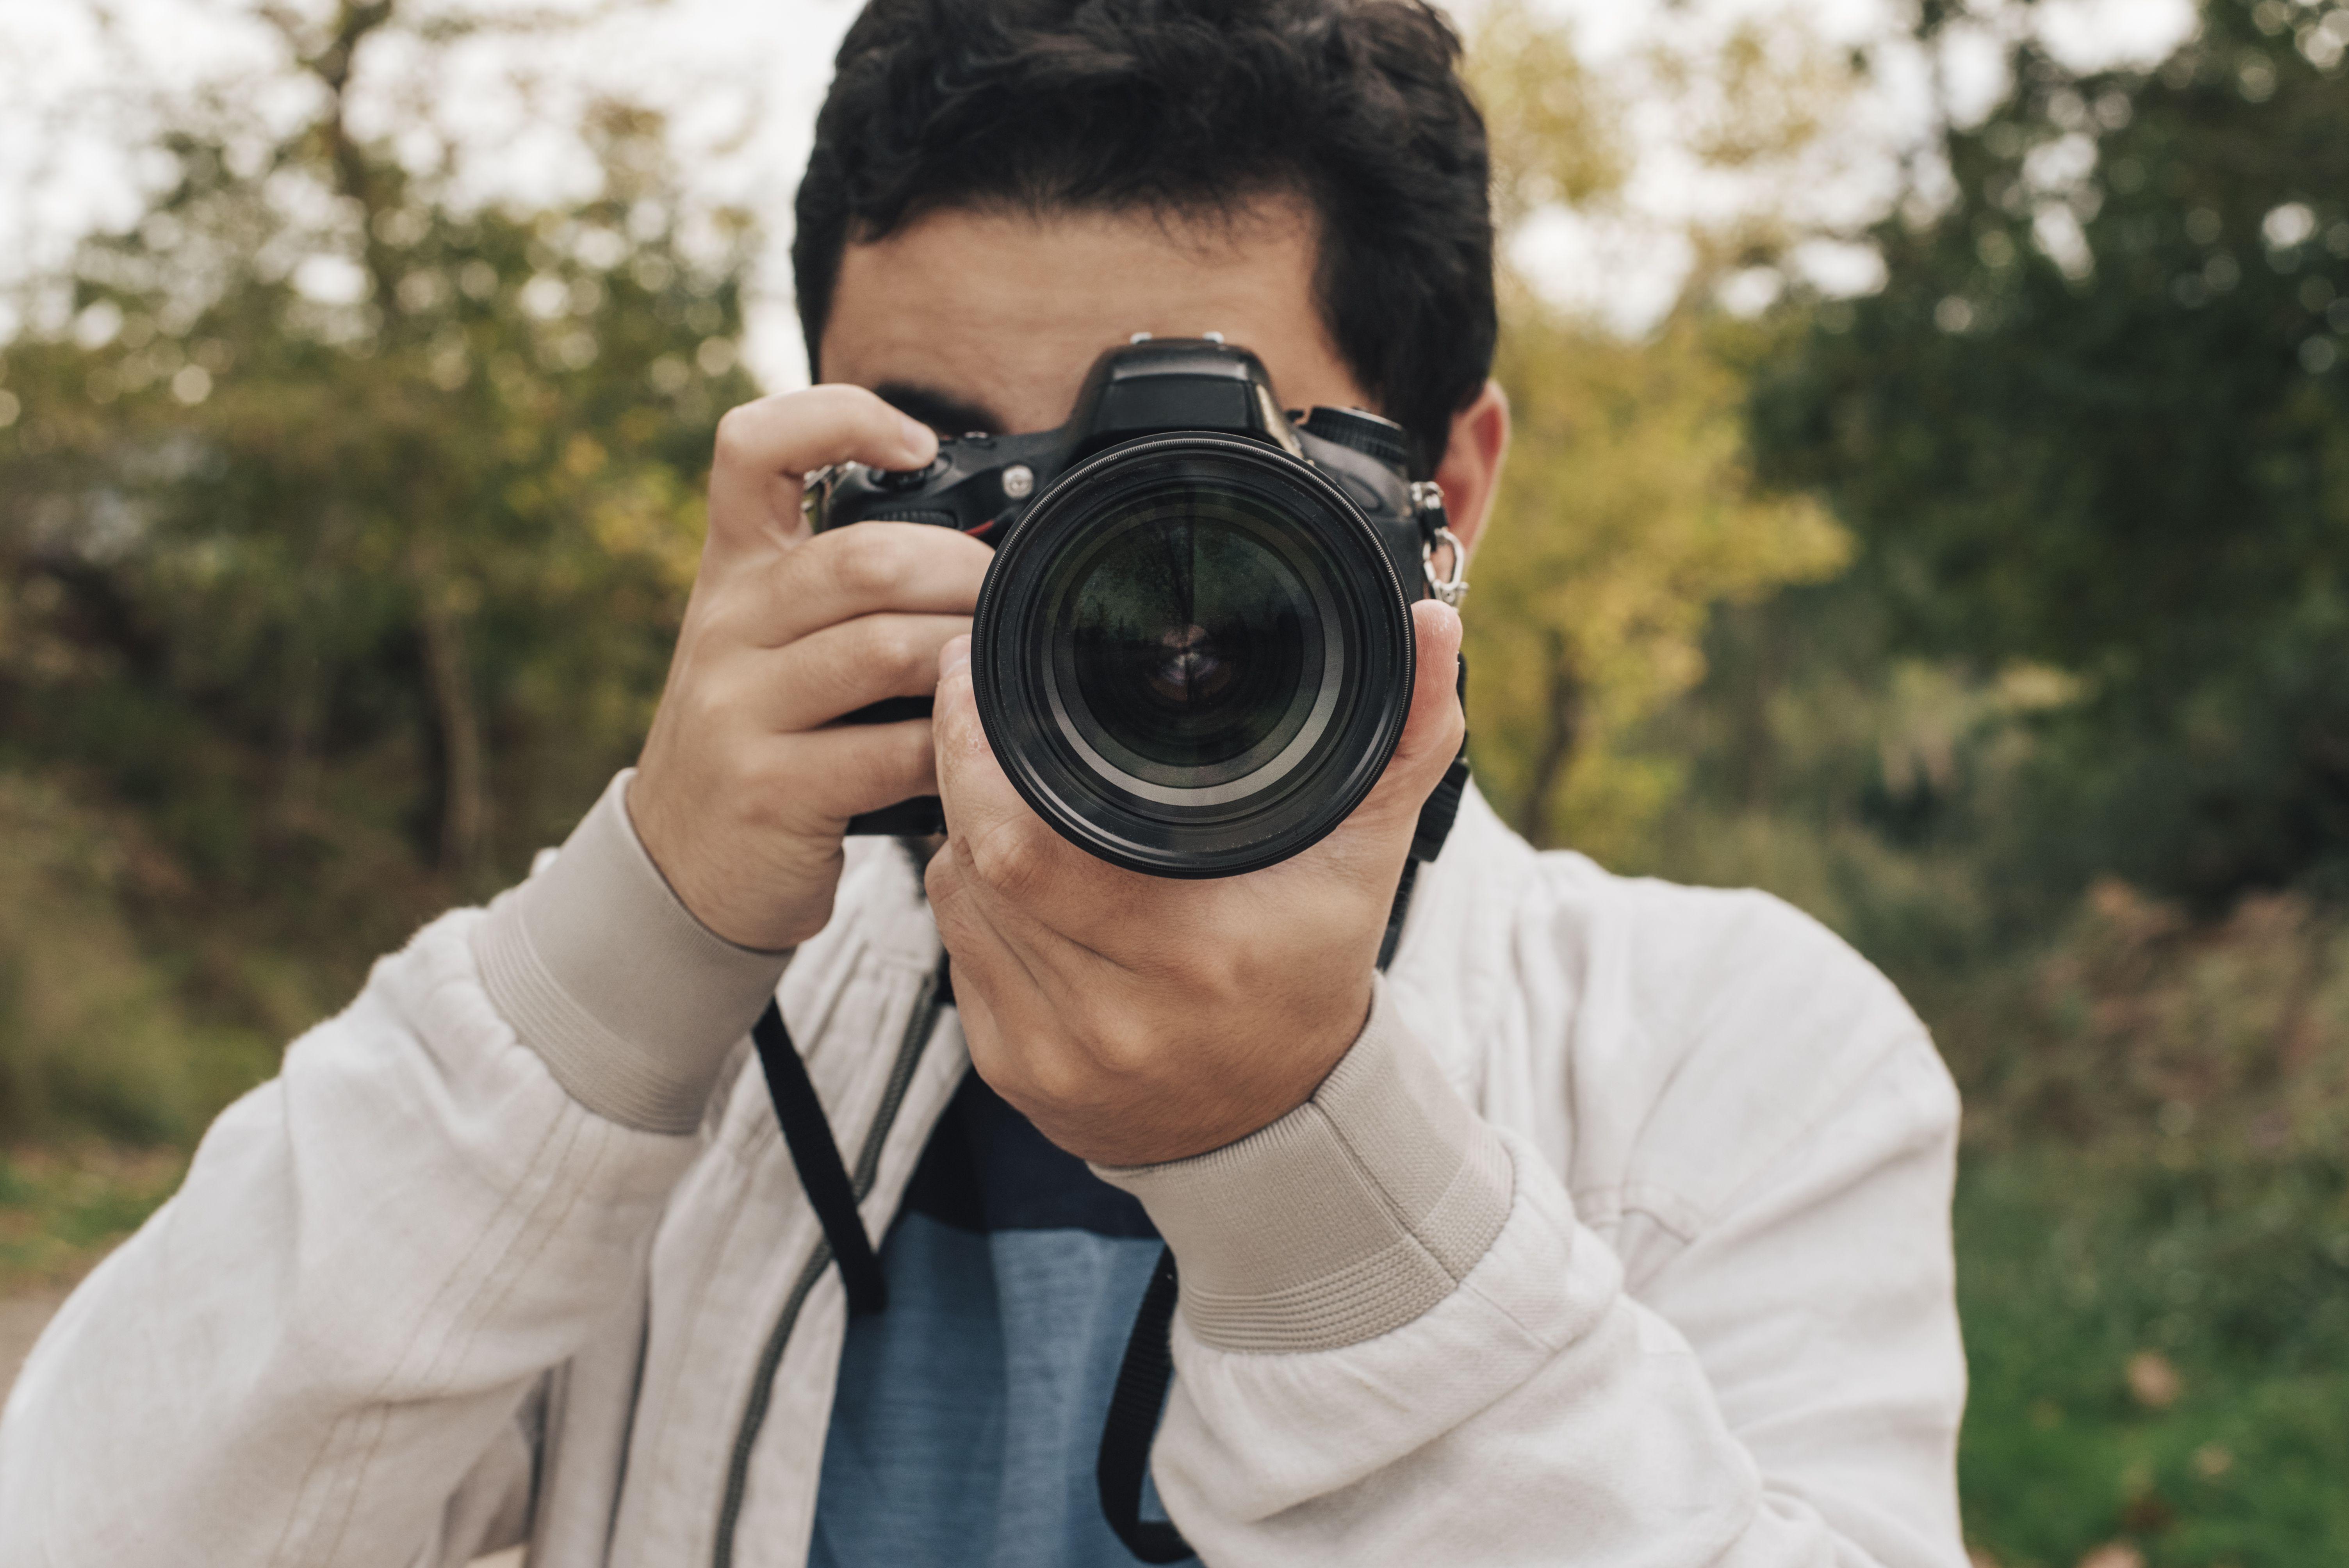 How Do DSLR Camera Buttons and Shutter Button Work?